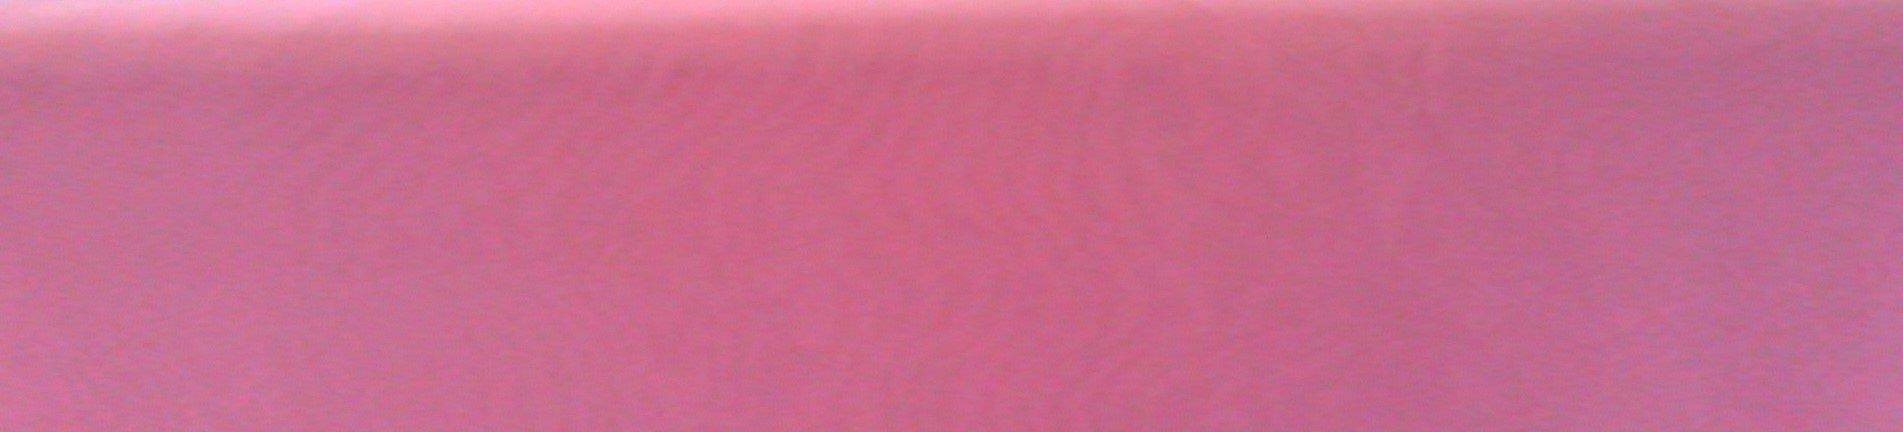 Butterfly Kisses Chiffon Pink # 712